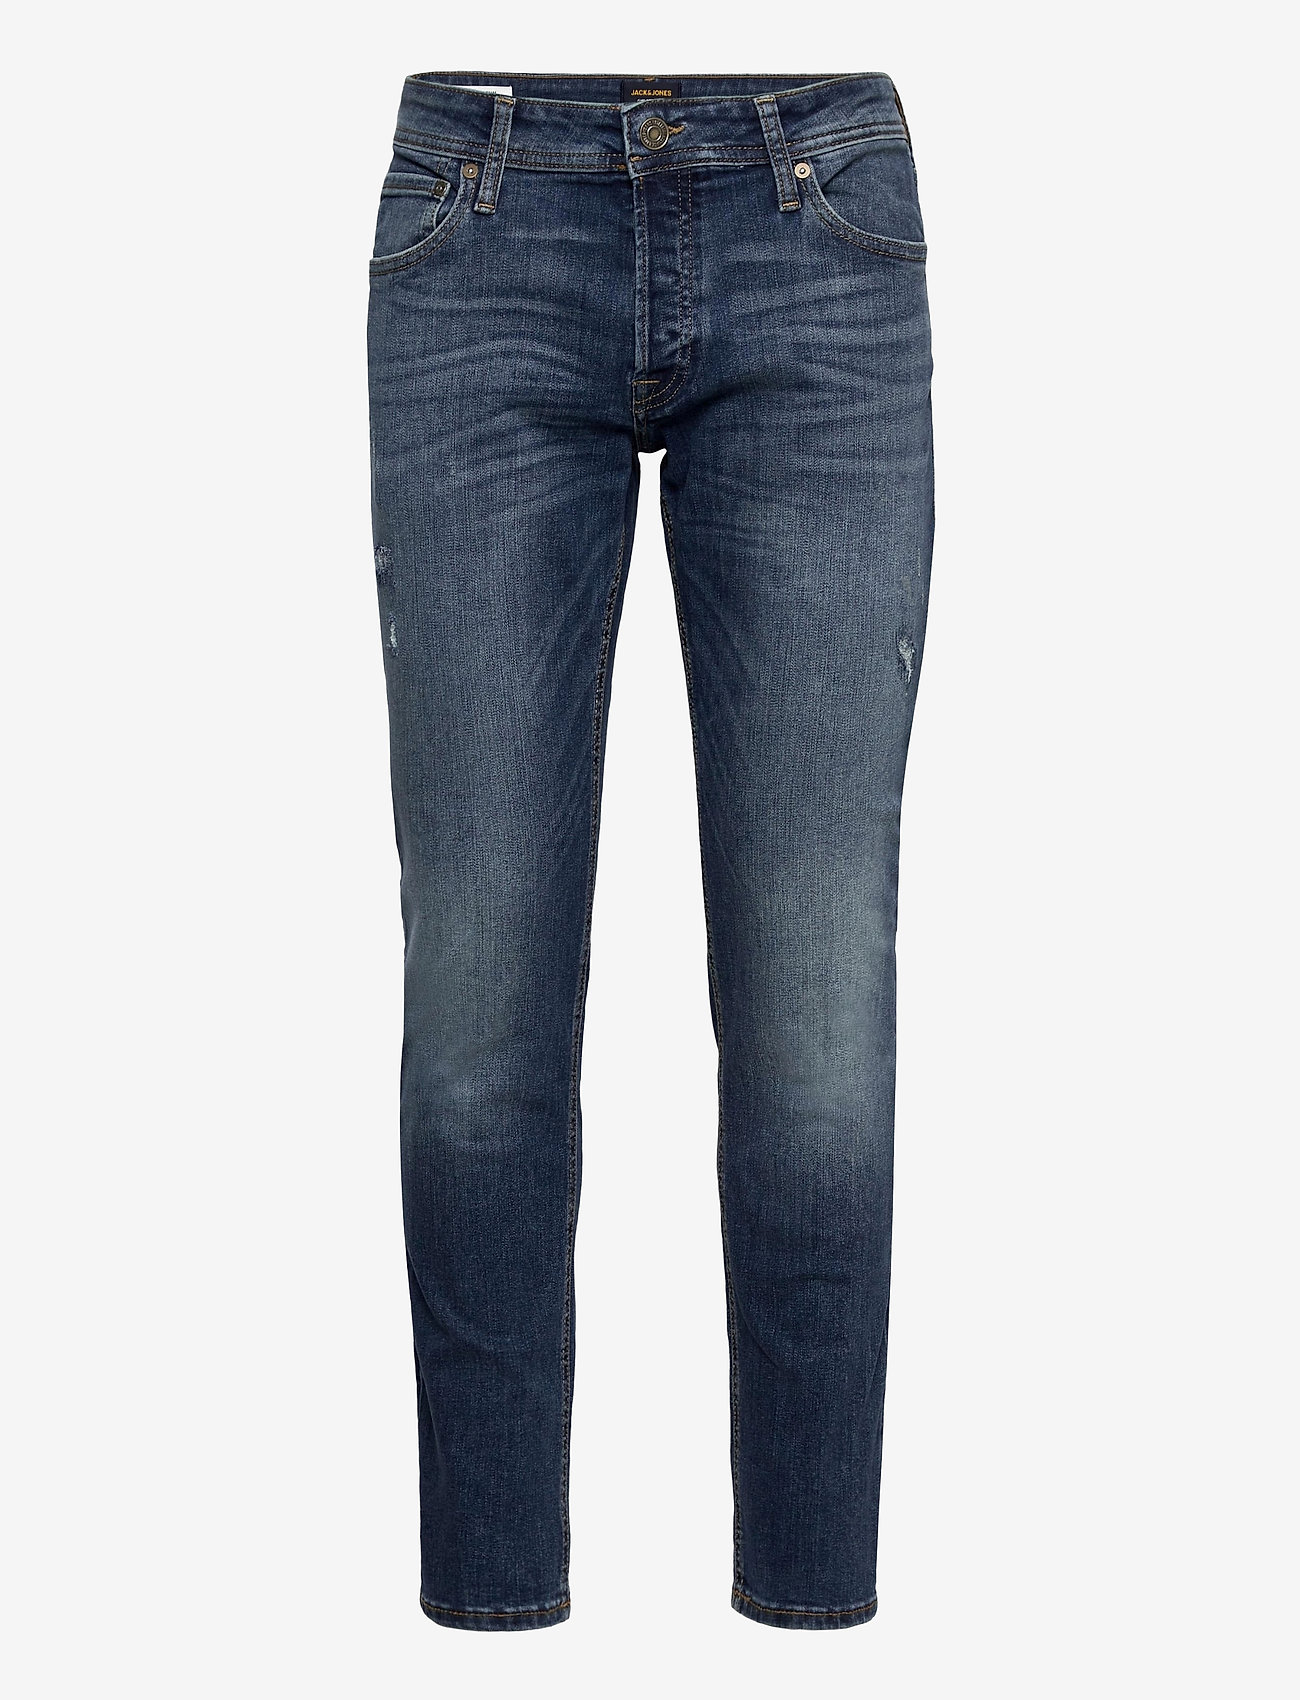 Jack & Jones - JJIGLENN JJORIGINAL AGI 035 50SPS - slim jeans - blue denim - 0